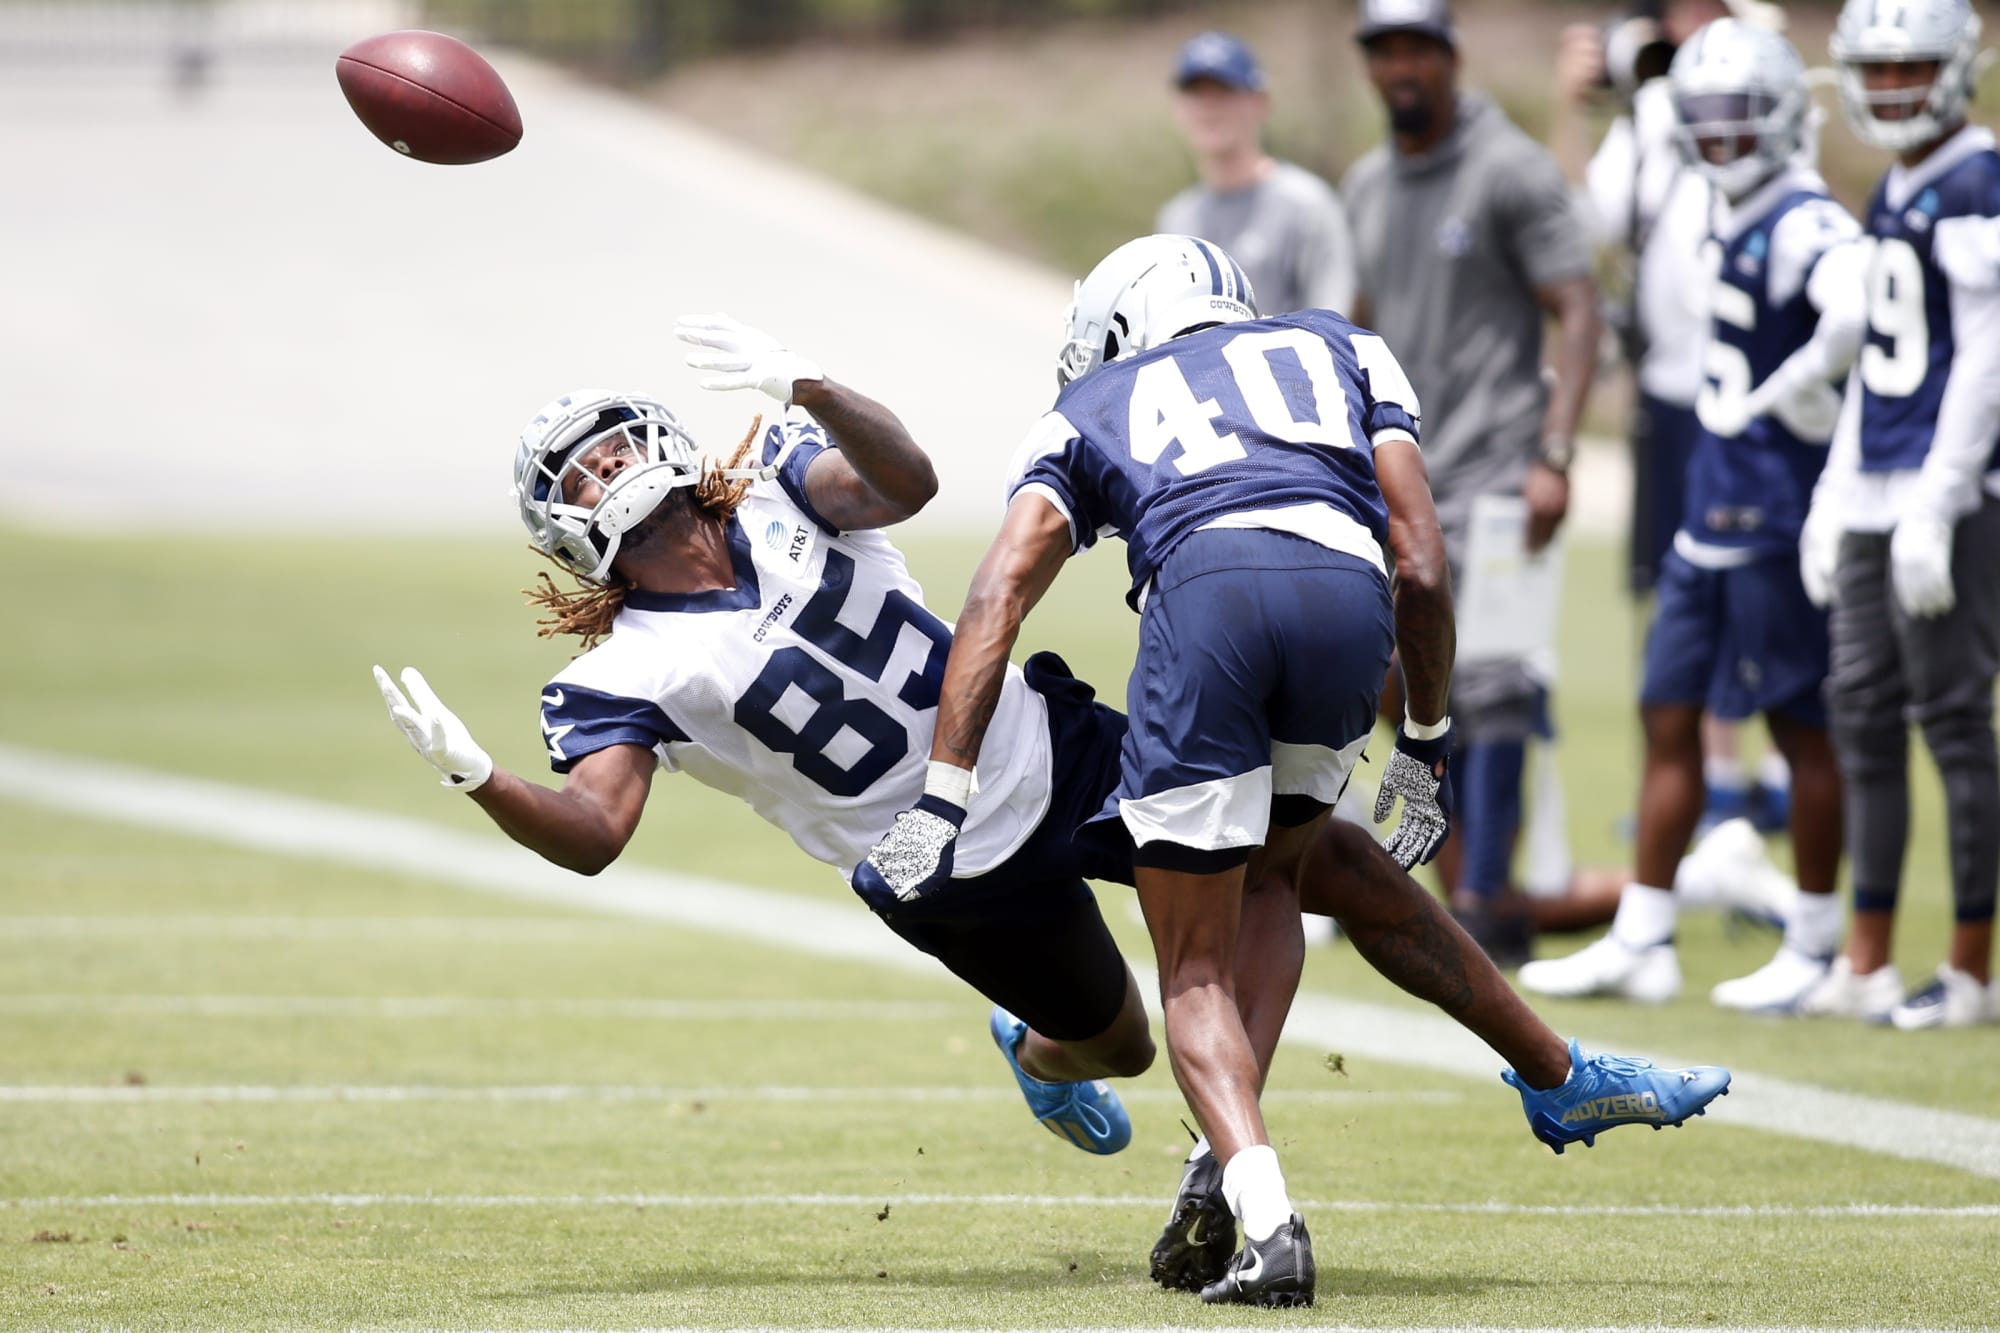 Dallas Cowboys Camp: Nahshon shines, Gregory pops, fitness prevails